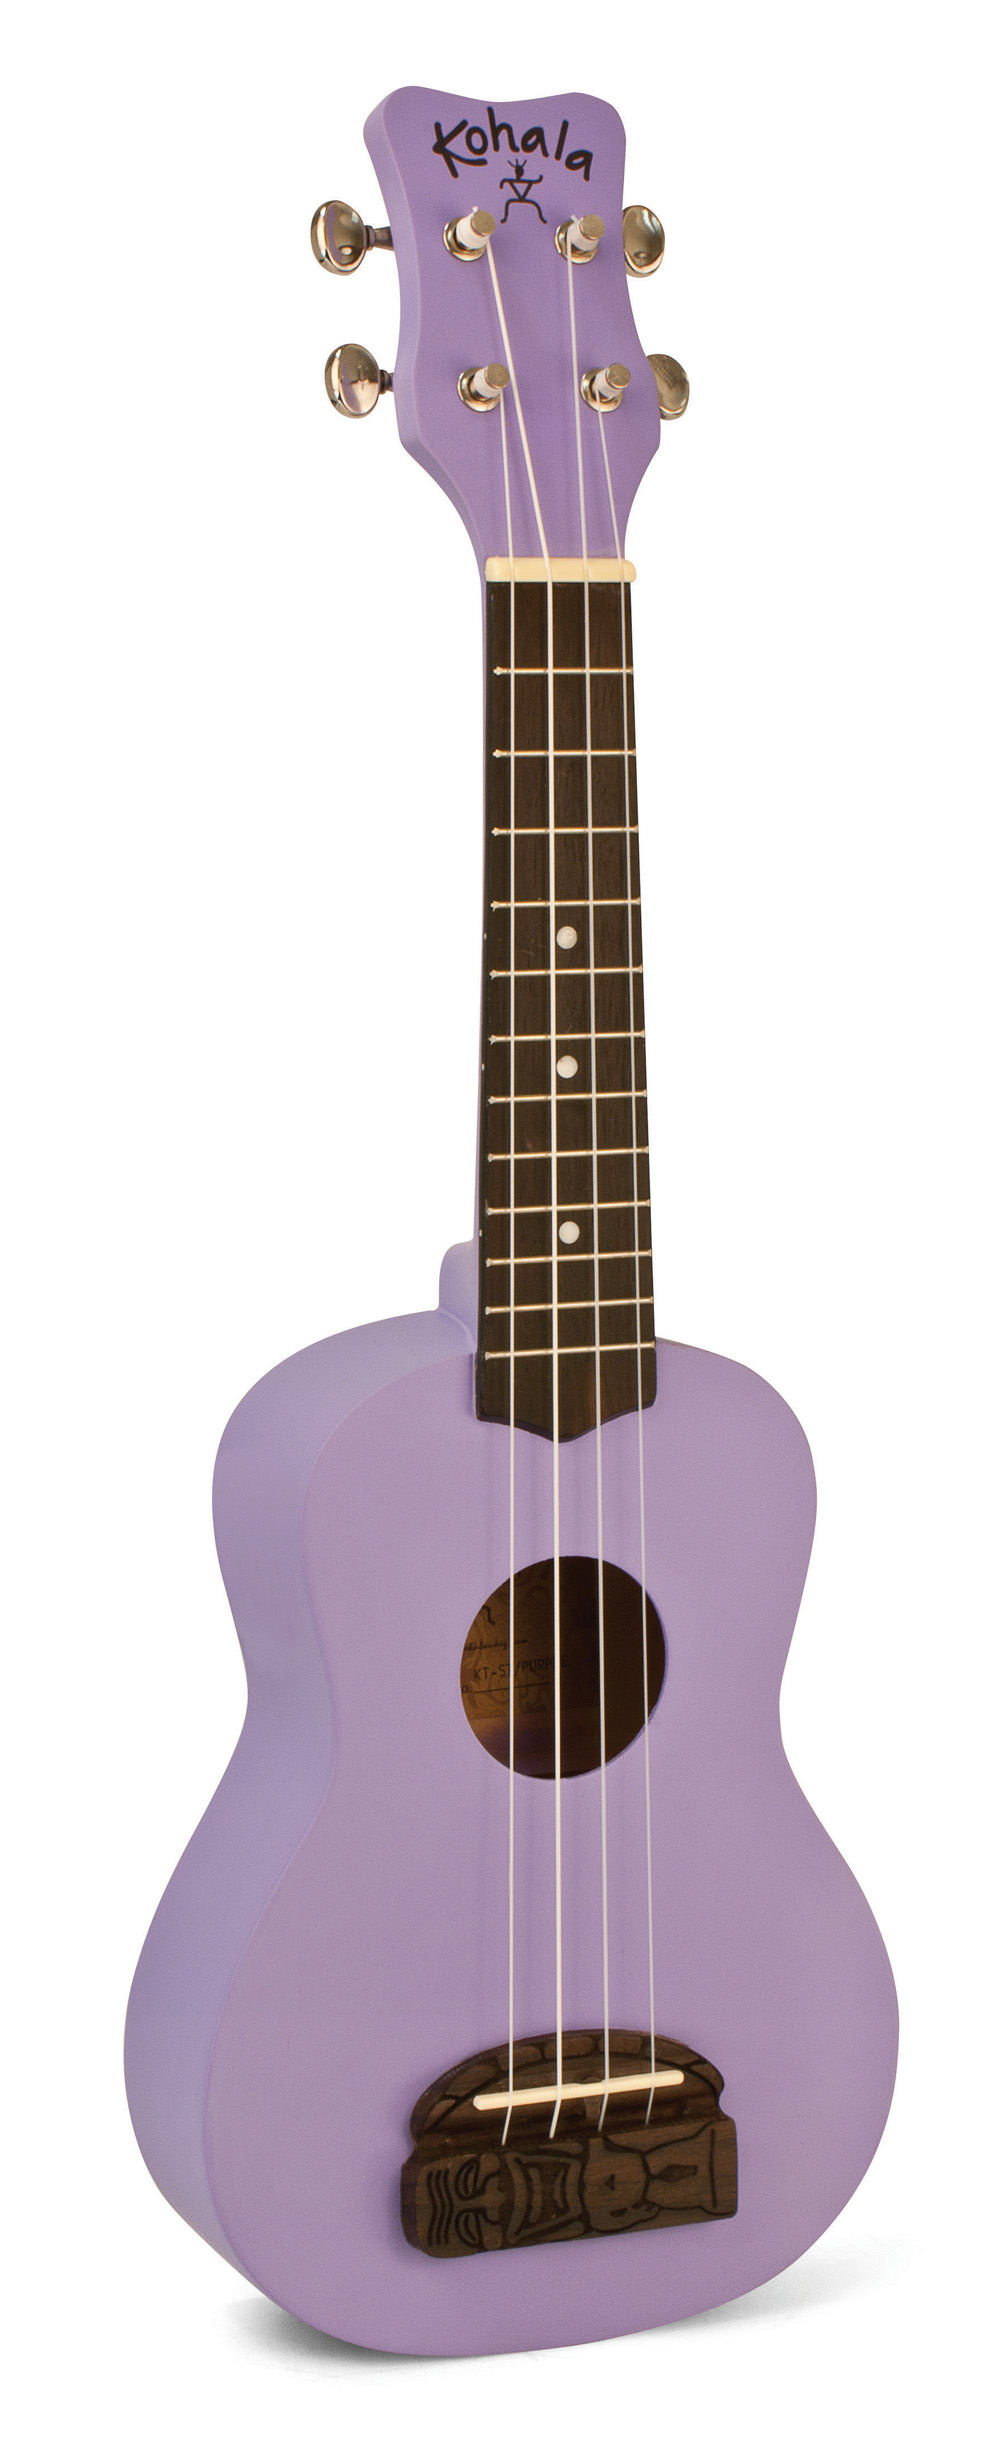 Kohala KT-SPU Purple Soprano Ukulele